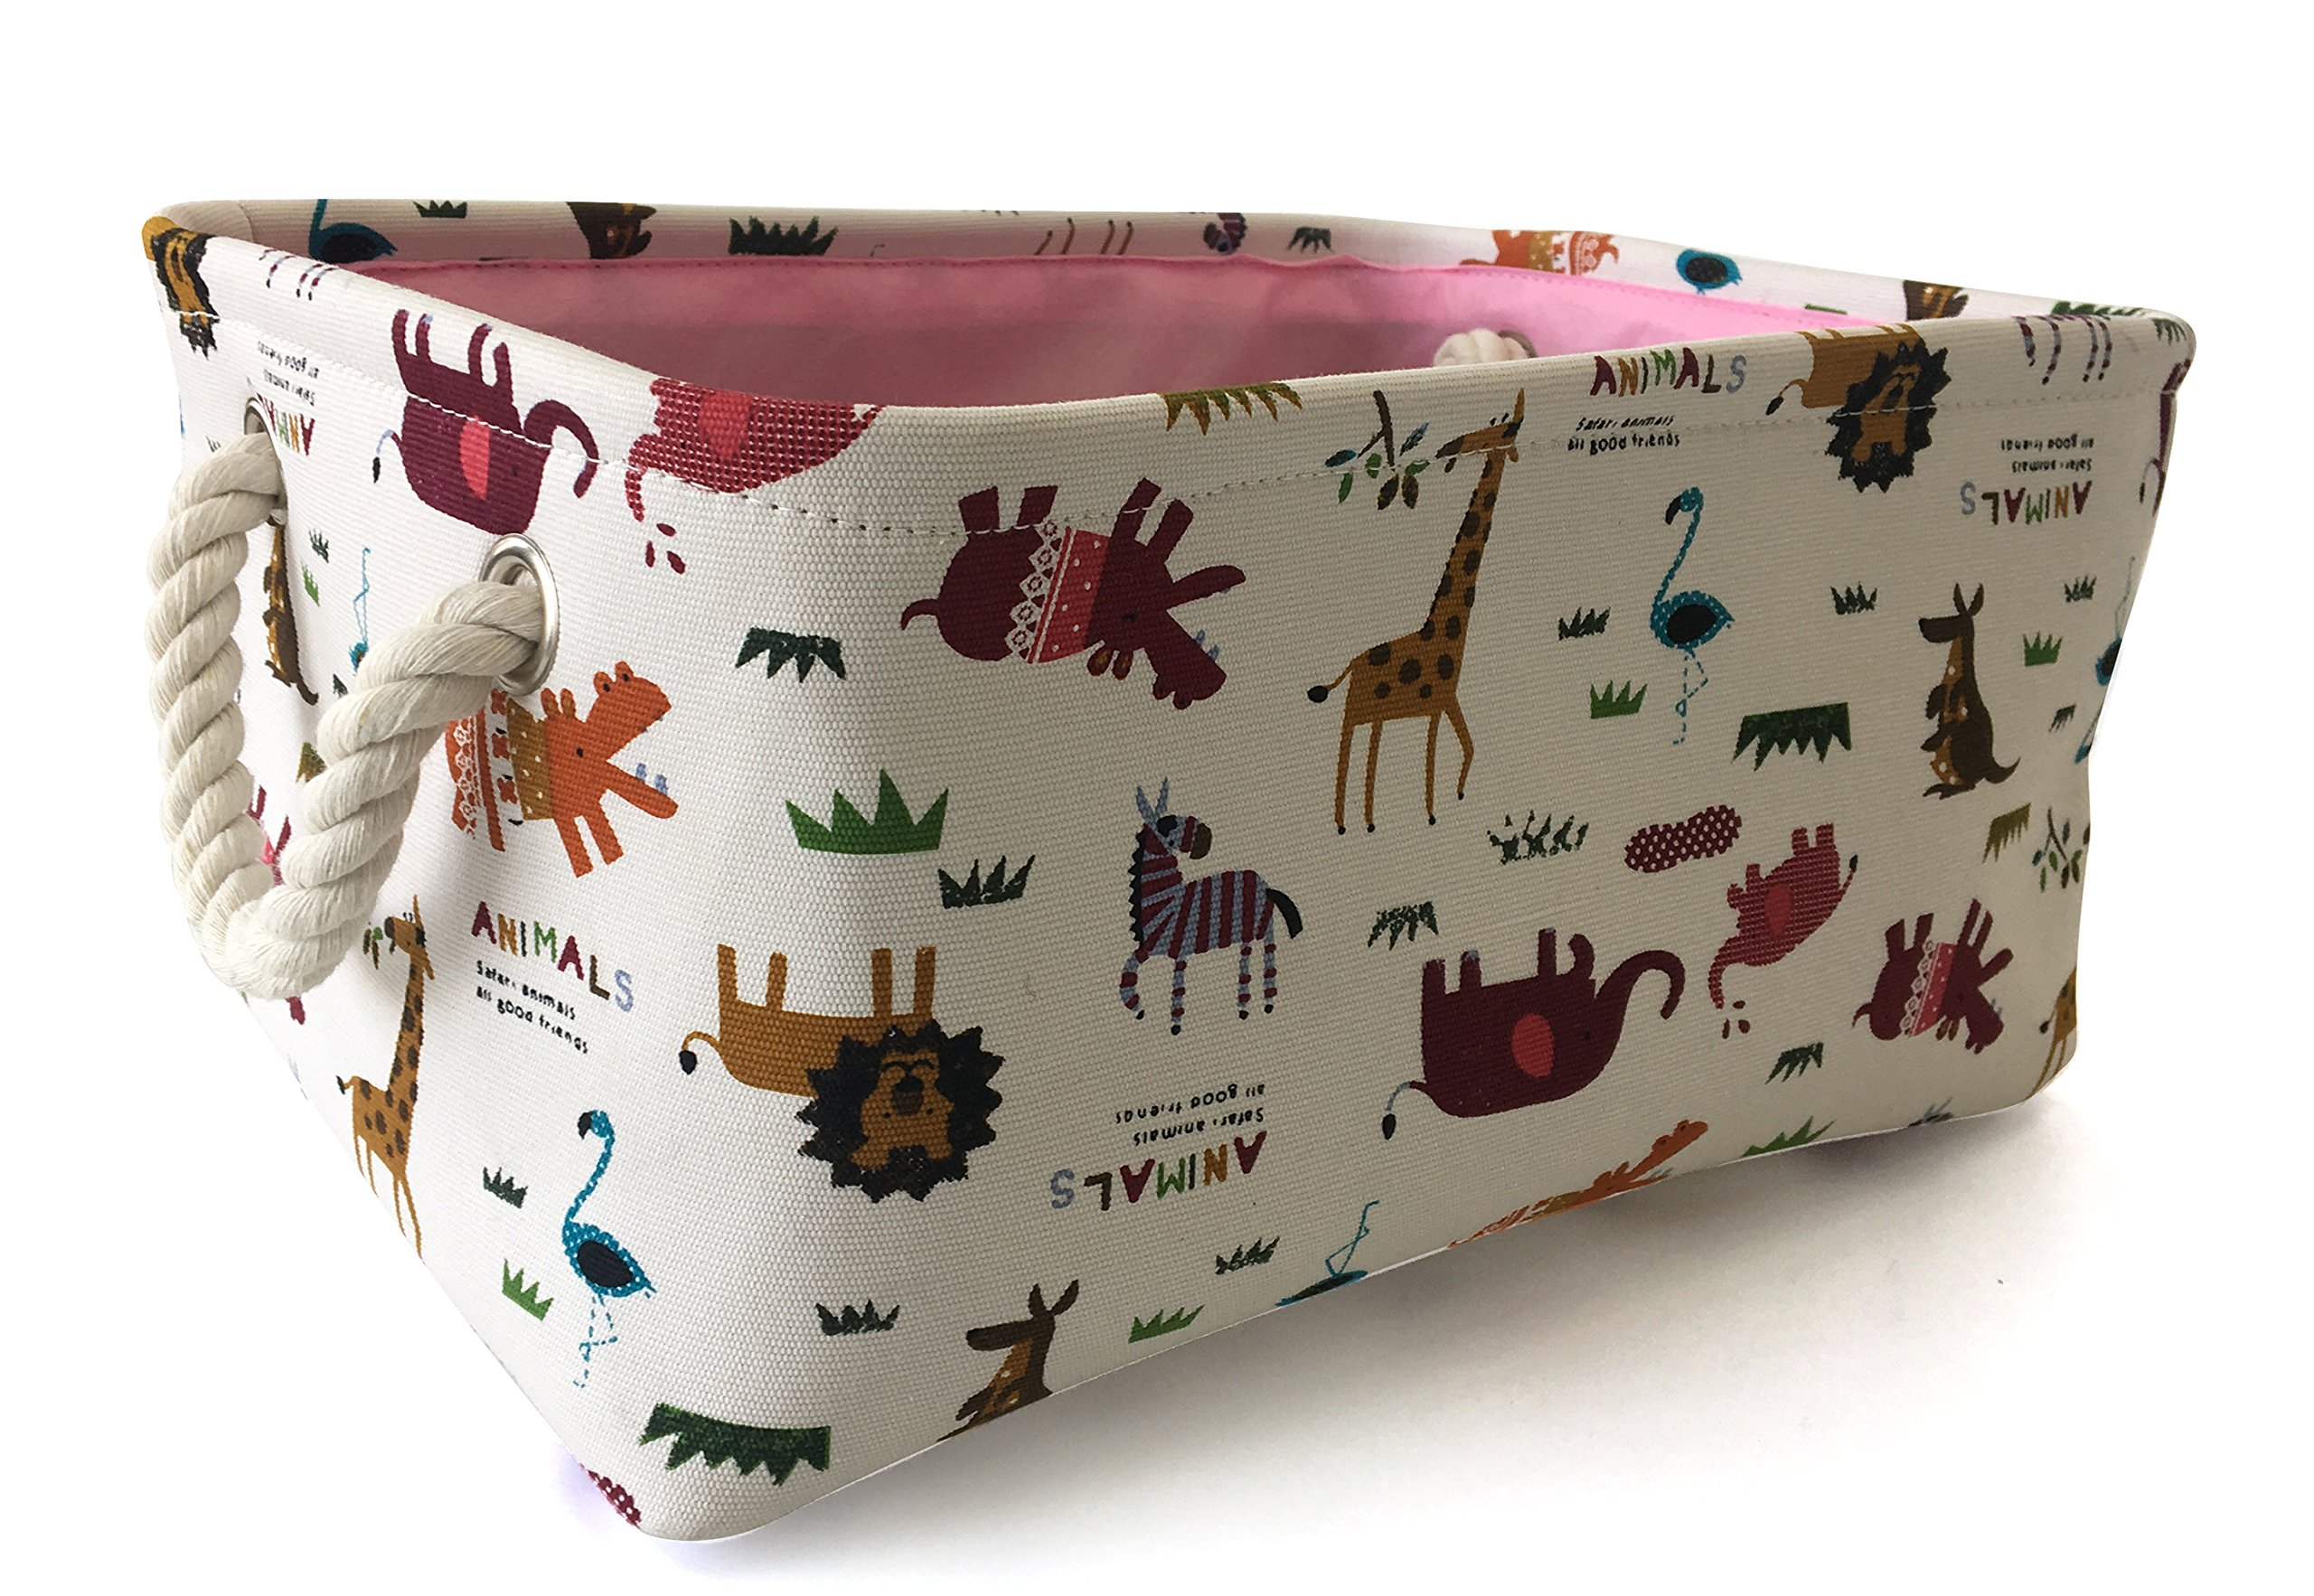 Rectangular Storage Basket Collapse Canvas Fabric Cartoon Storage Cube Bin With Handles for Organizing Home/Kitchen/Kids Toy/Office/ Closet/Shelf Baskets(Animals)